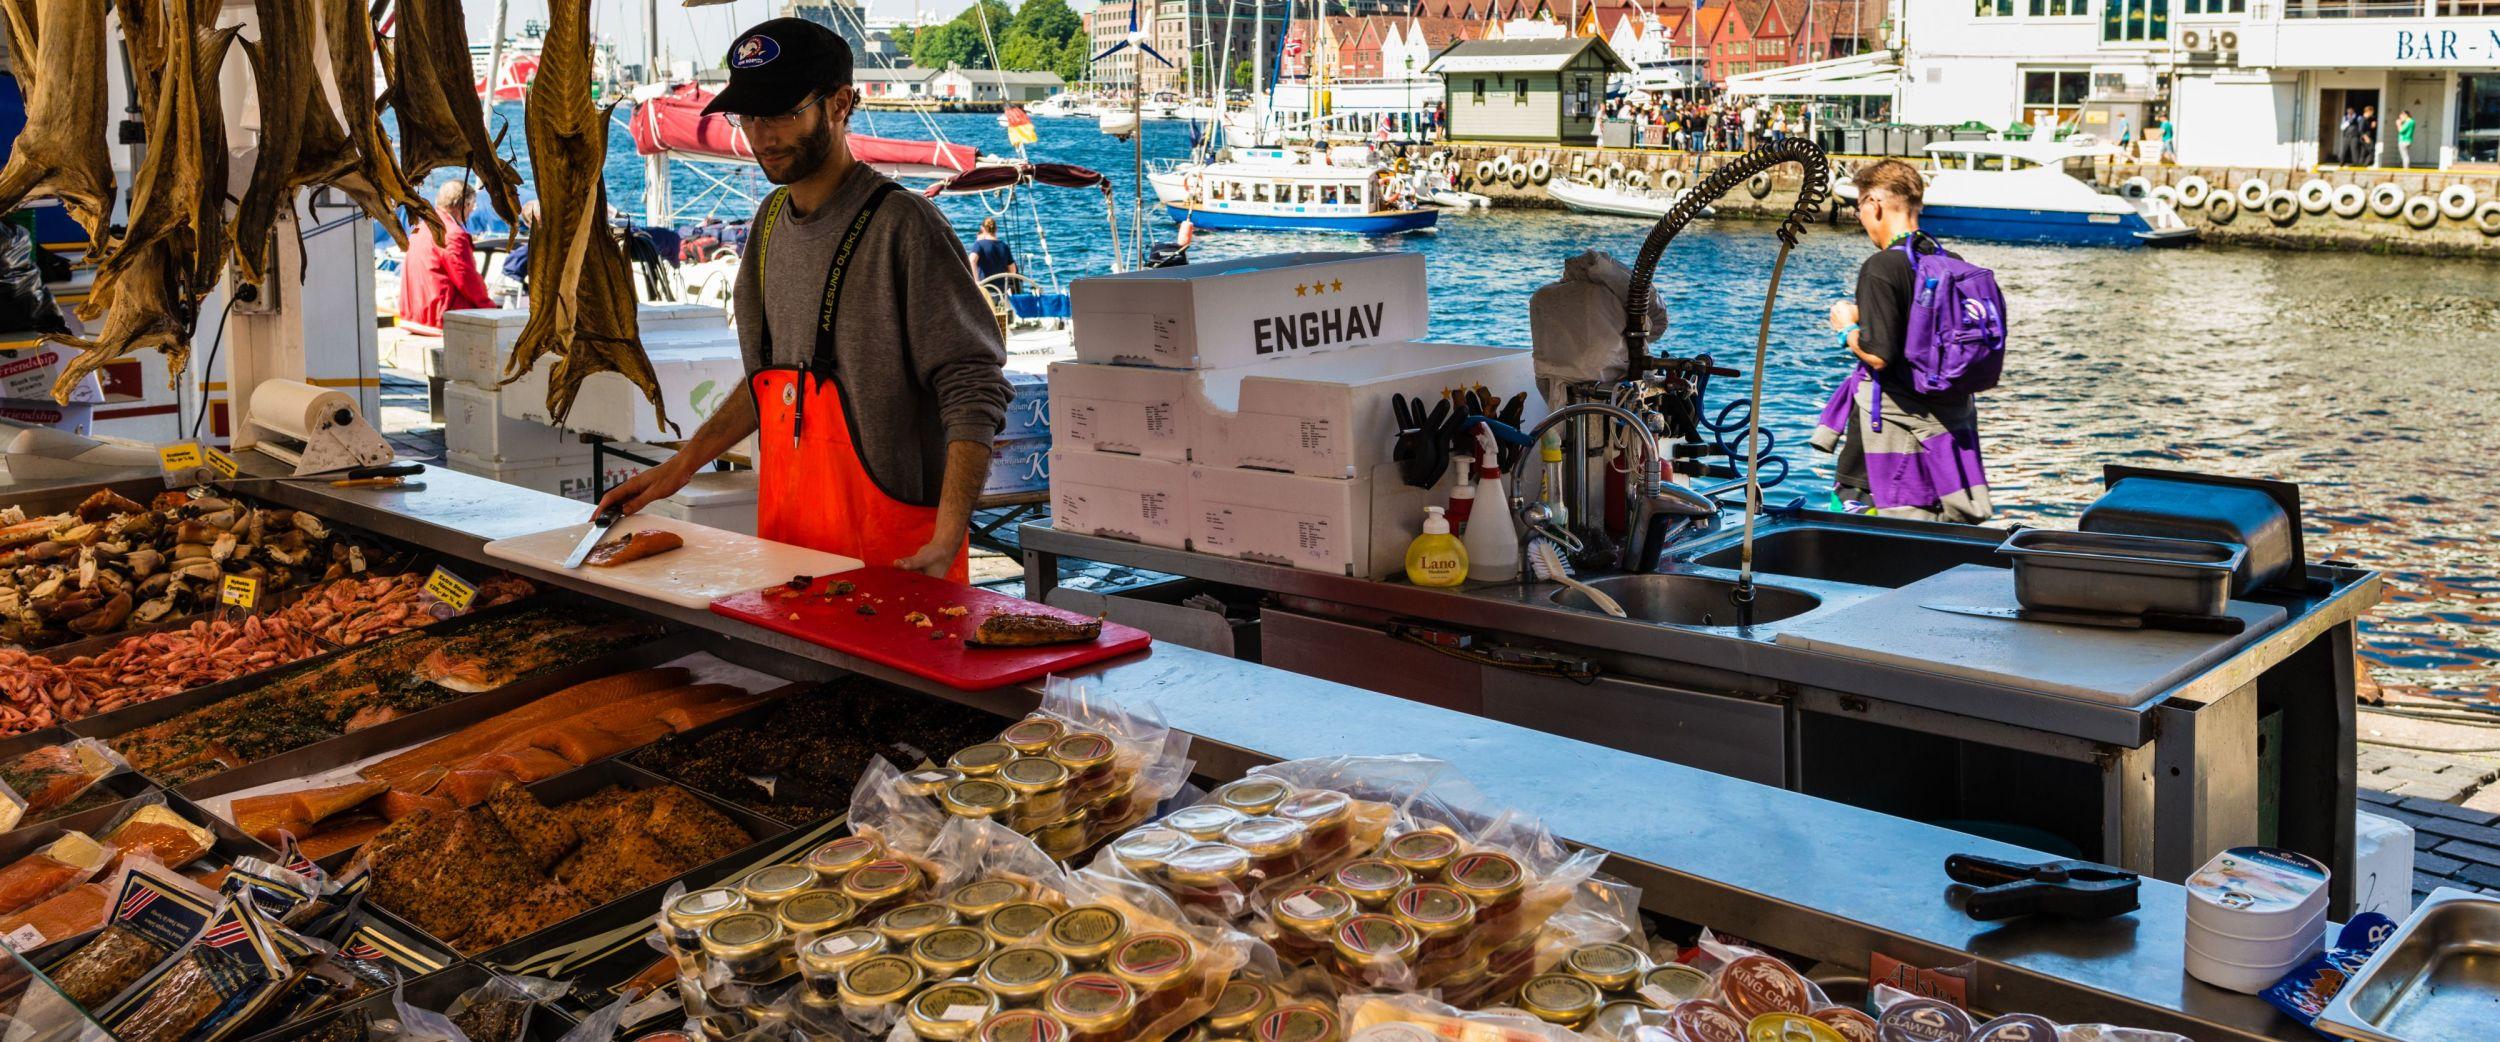 Fishmarket. Fisketorget i Bergen